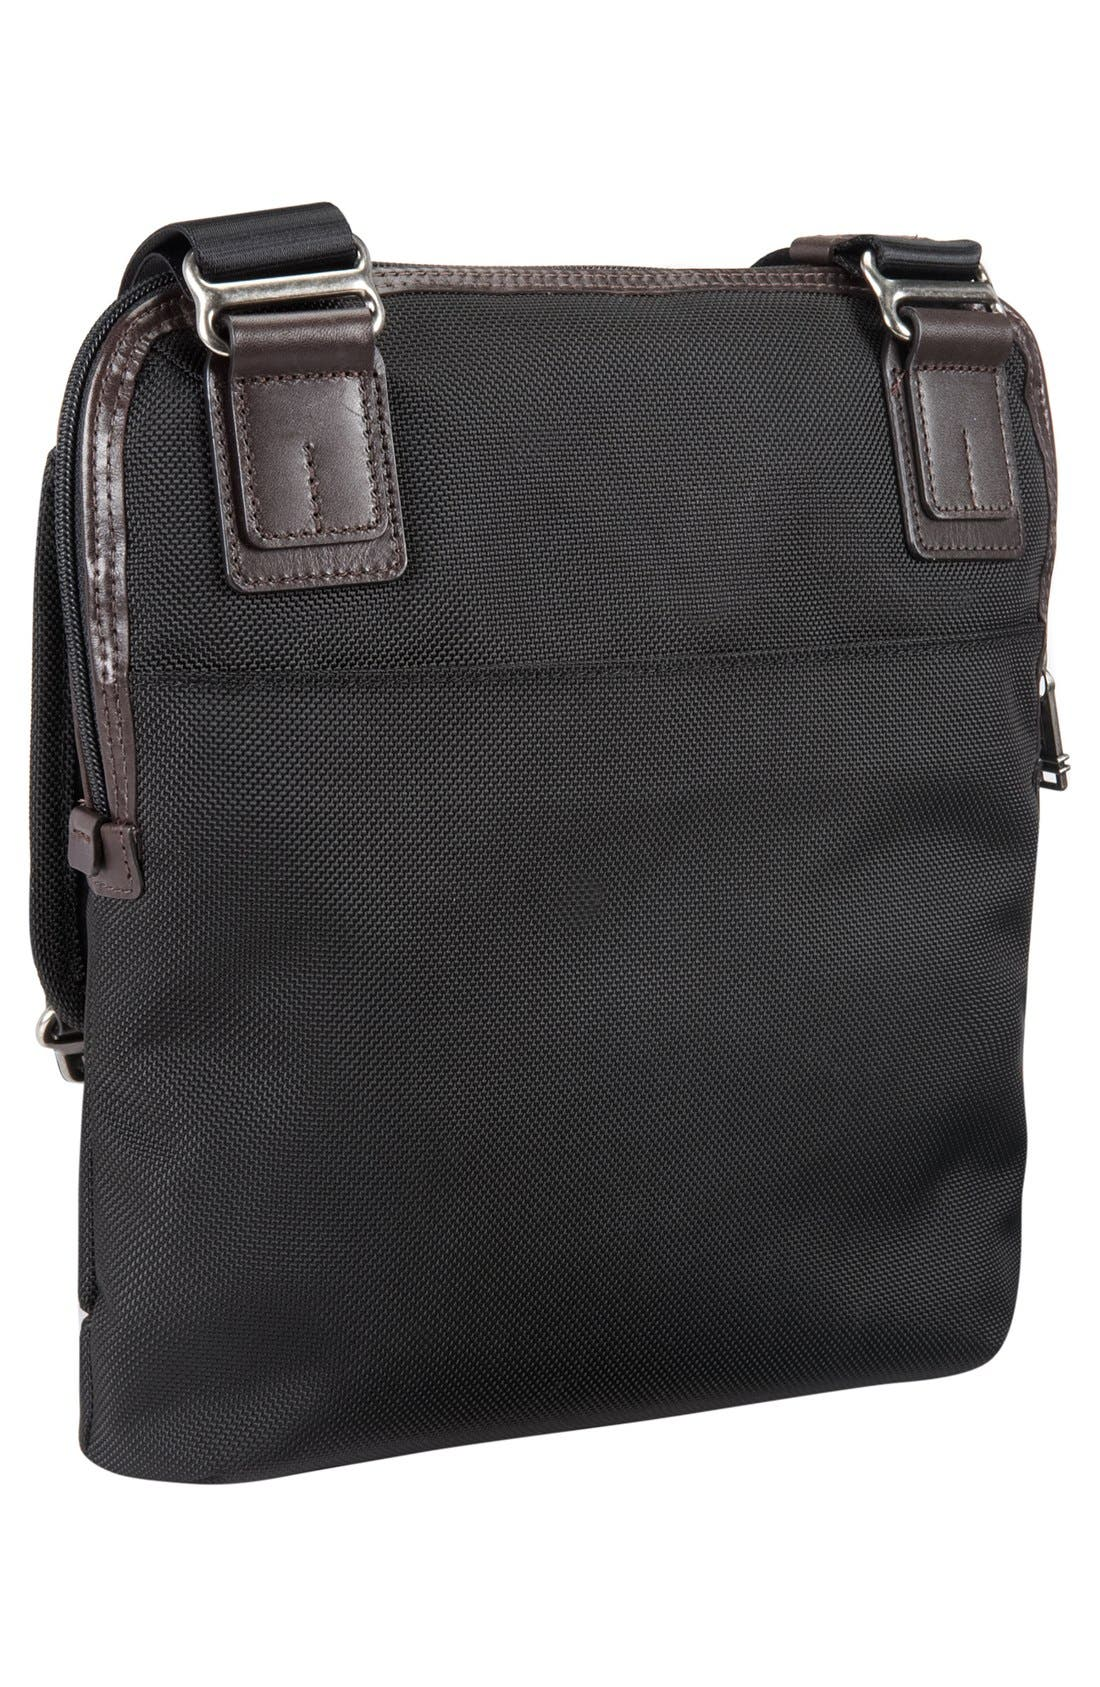 TUMI,                             'Alpha Bravo - Annapolis' Zip Flap Messenger Bag,                             Alternate thumbnail 5, color,                             001